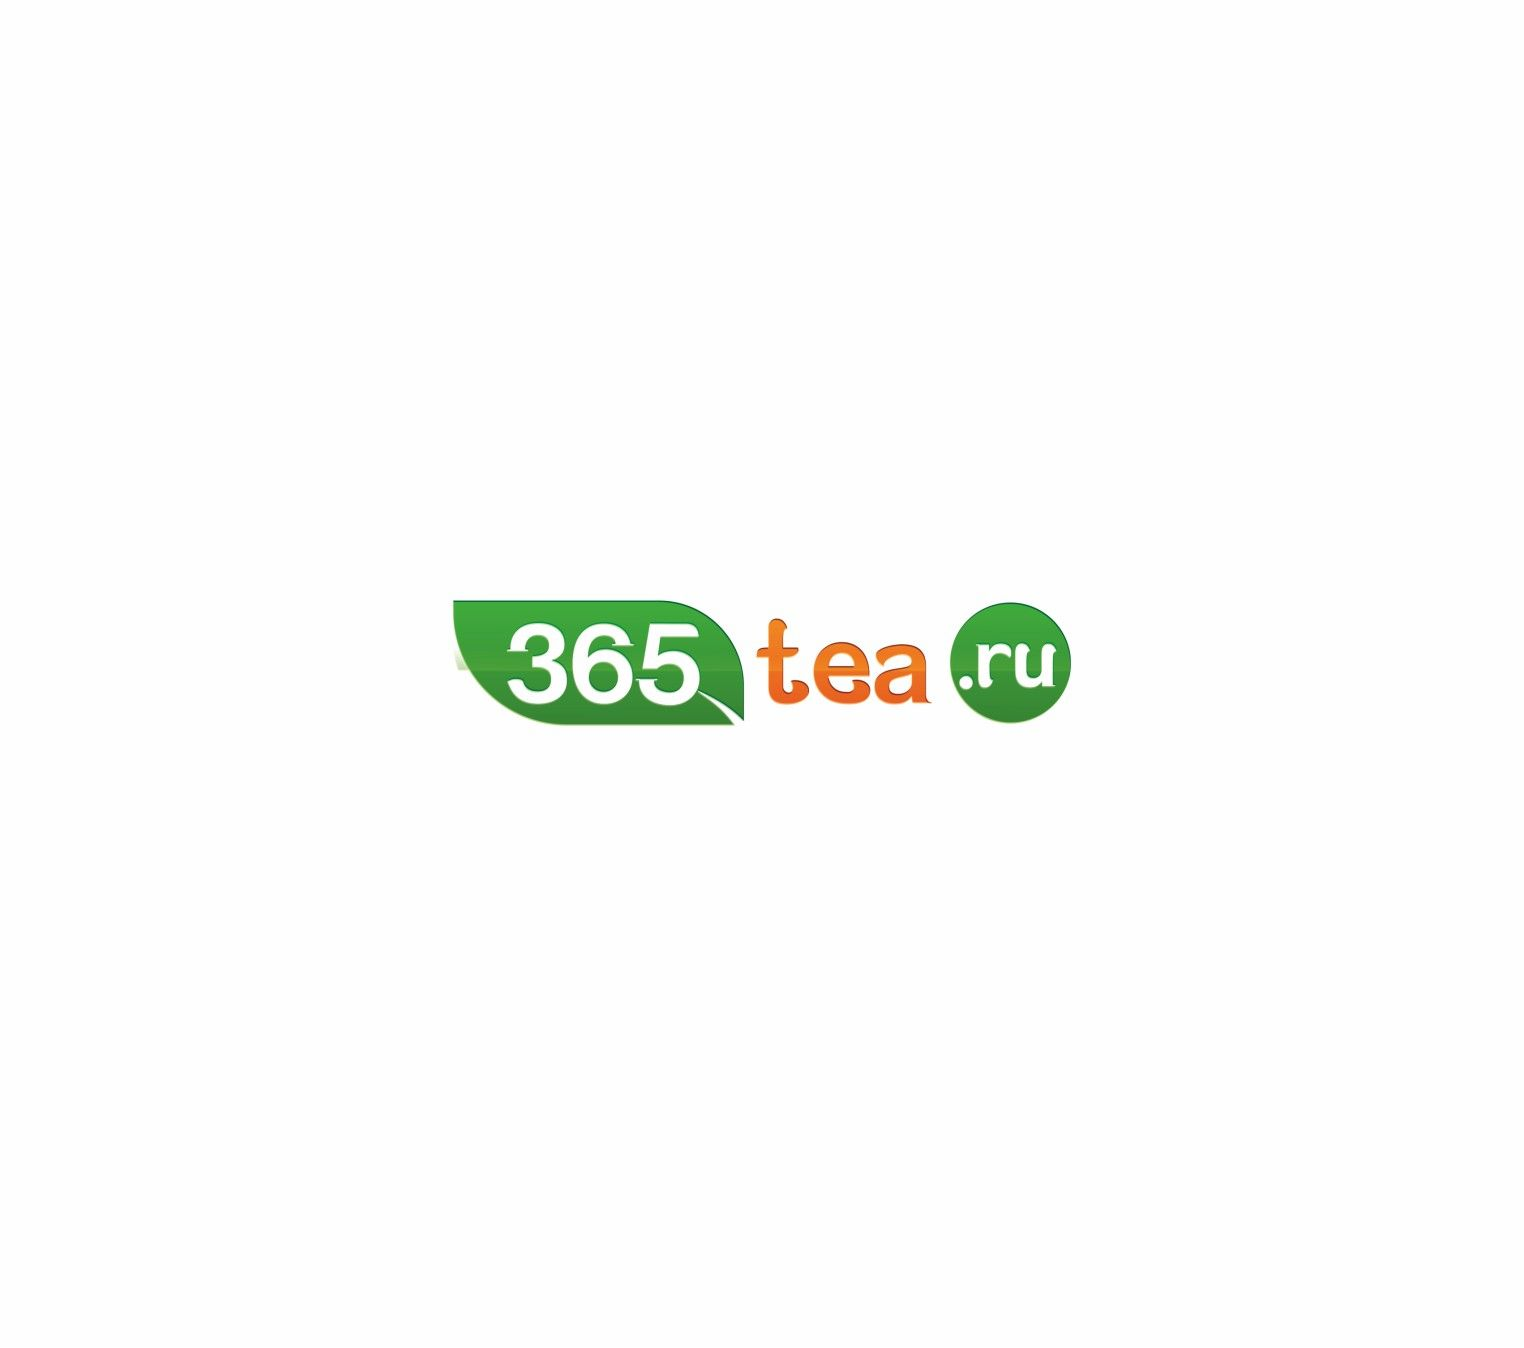 Логотип для 365tea.ru или 365TEA.RU - дизайнер Katarinka